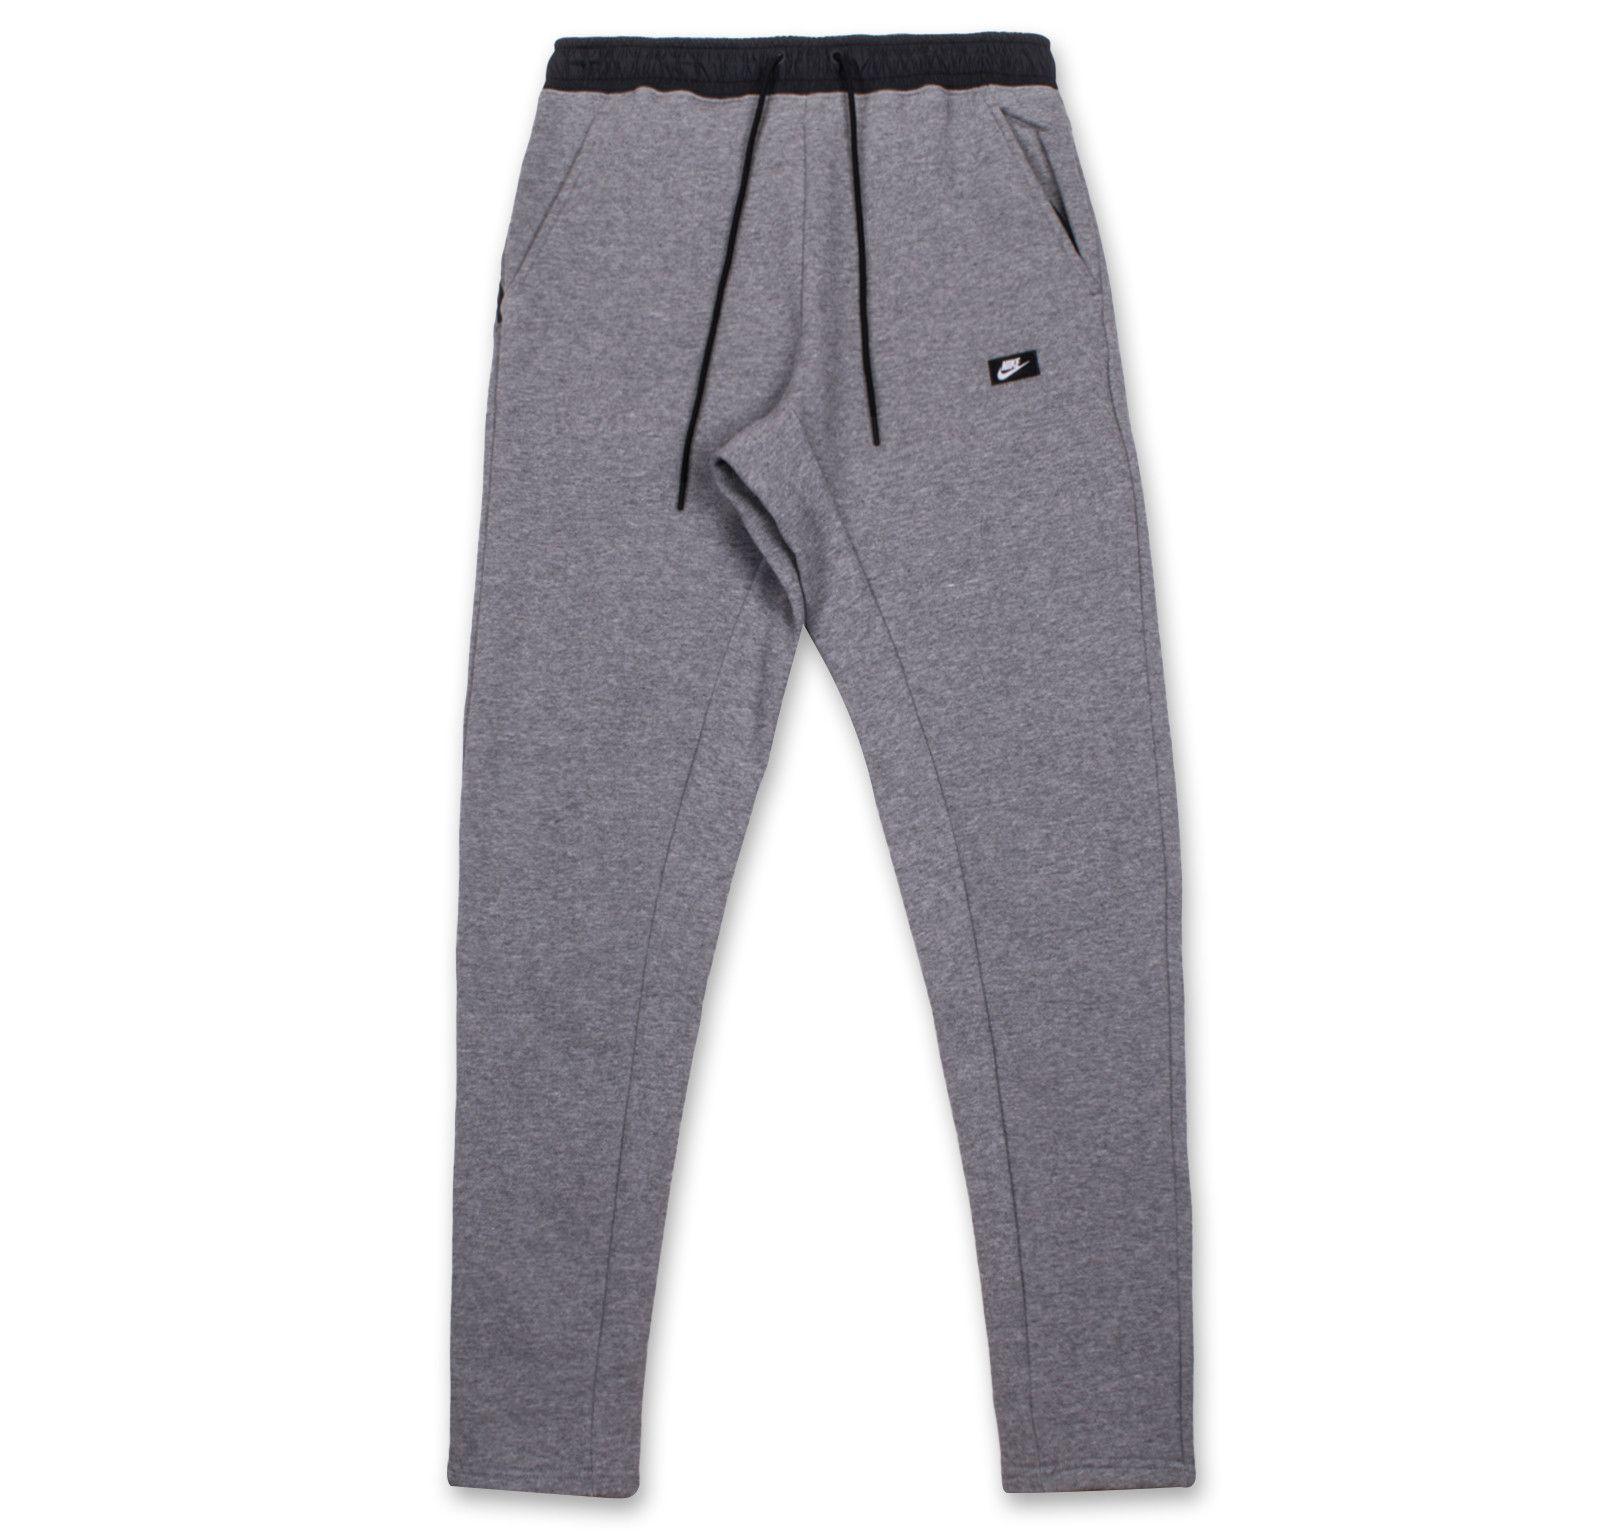 Nike Sportswear Modern Sweatpants-Carbon Heather Black